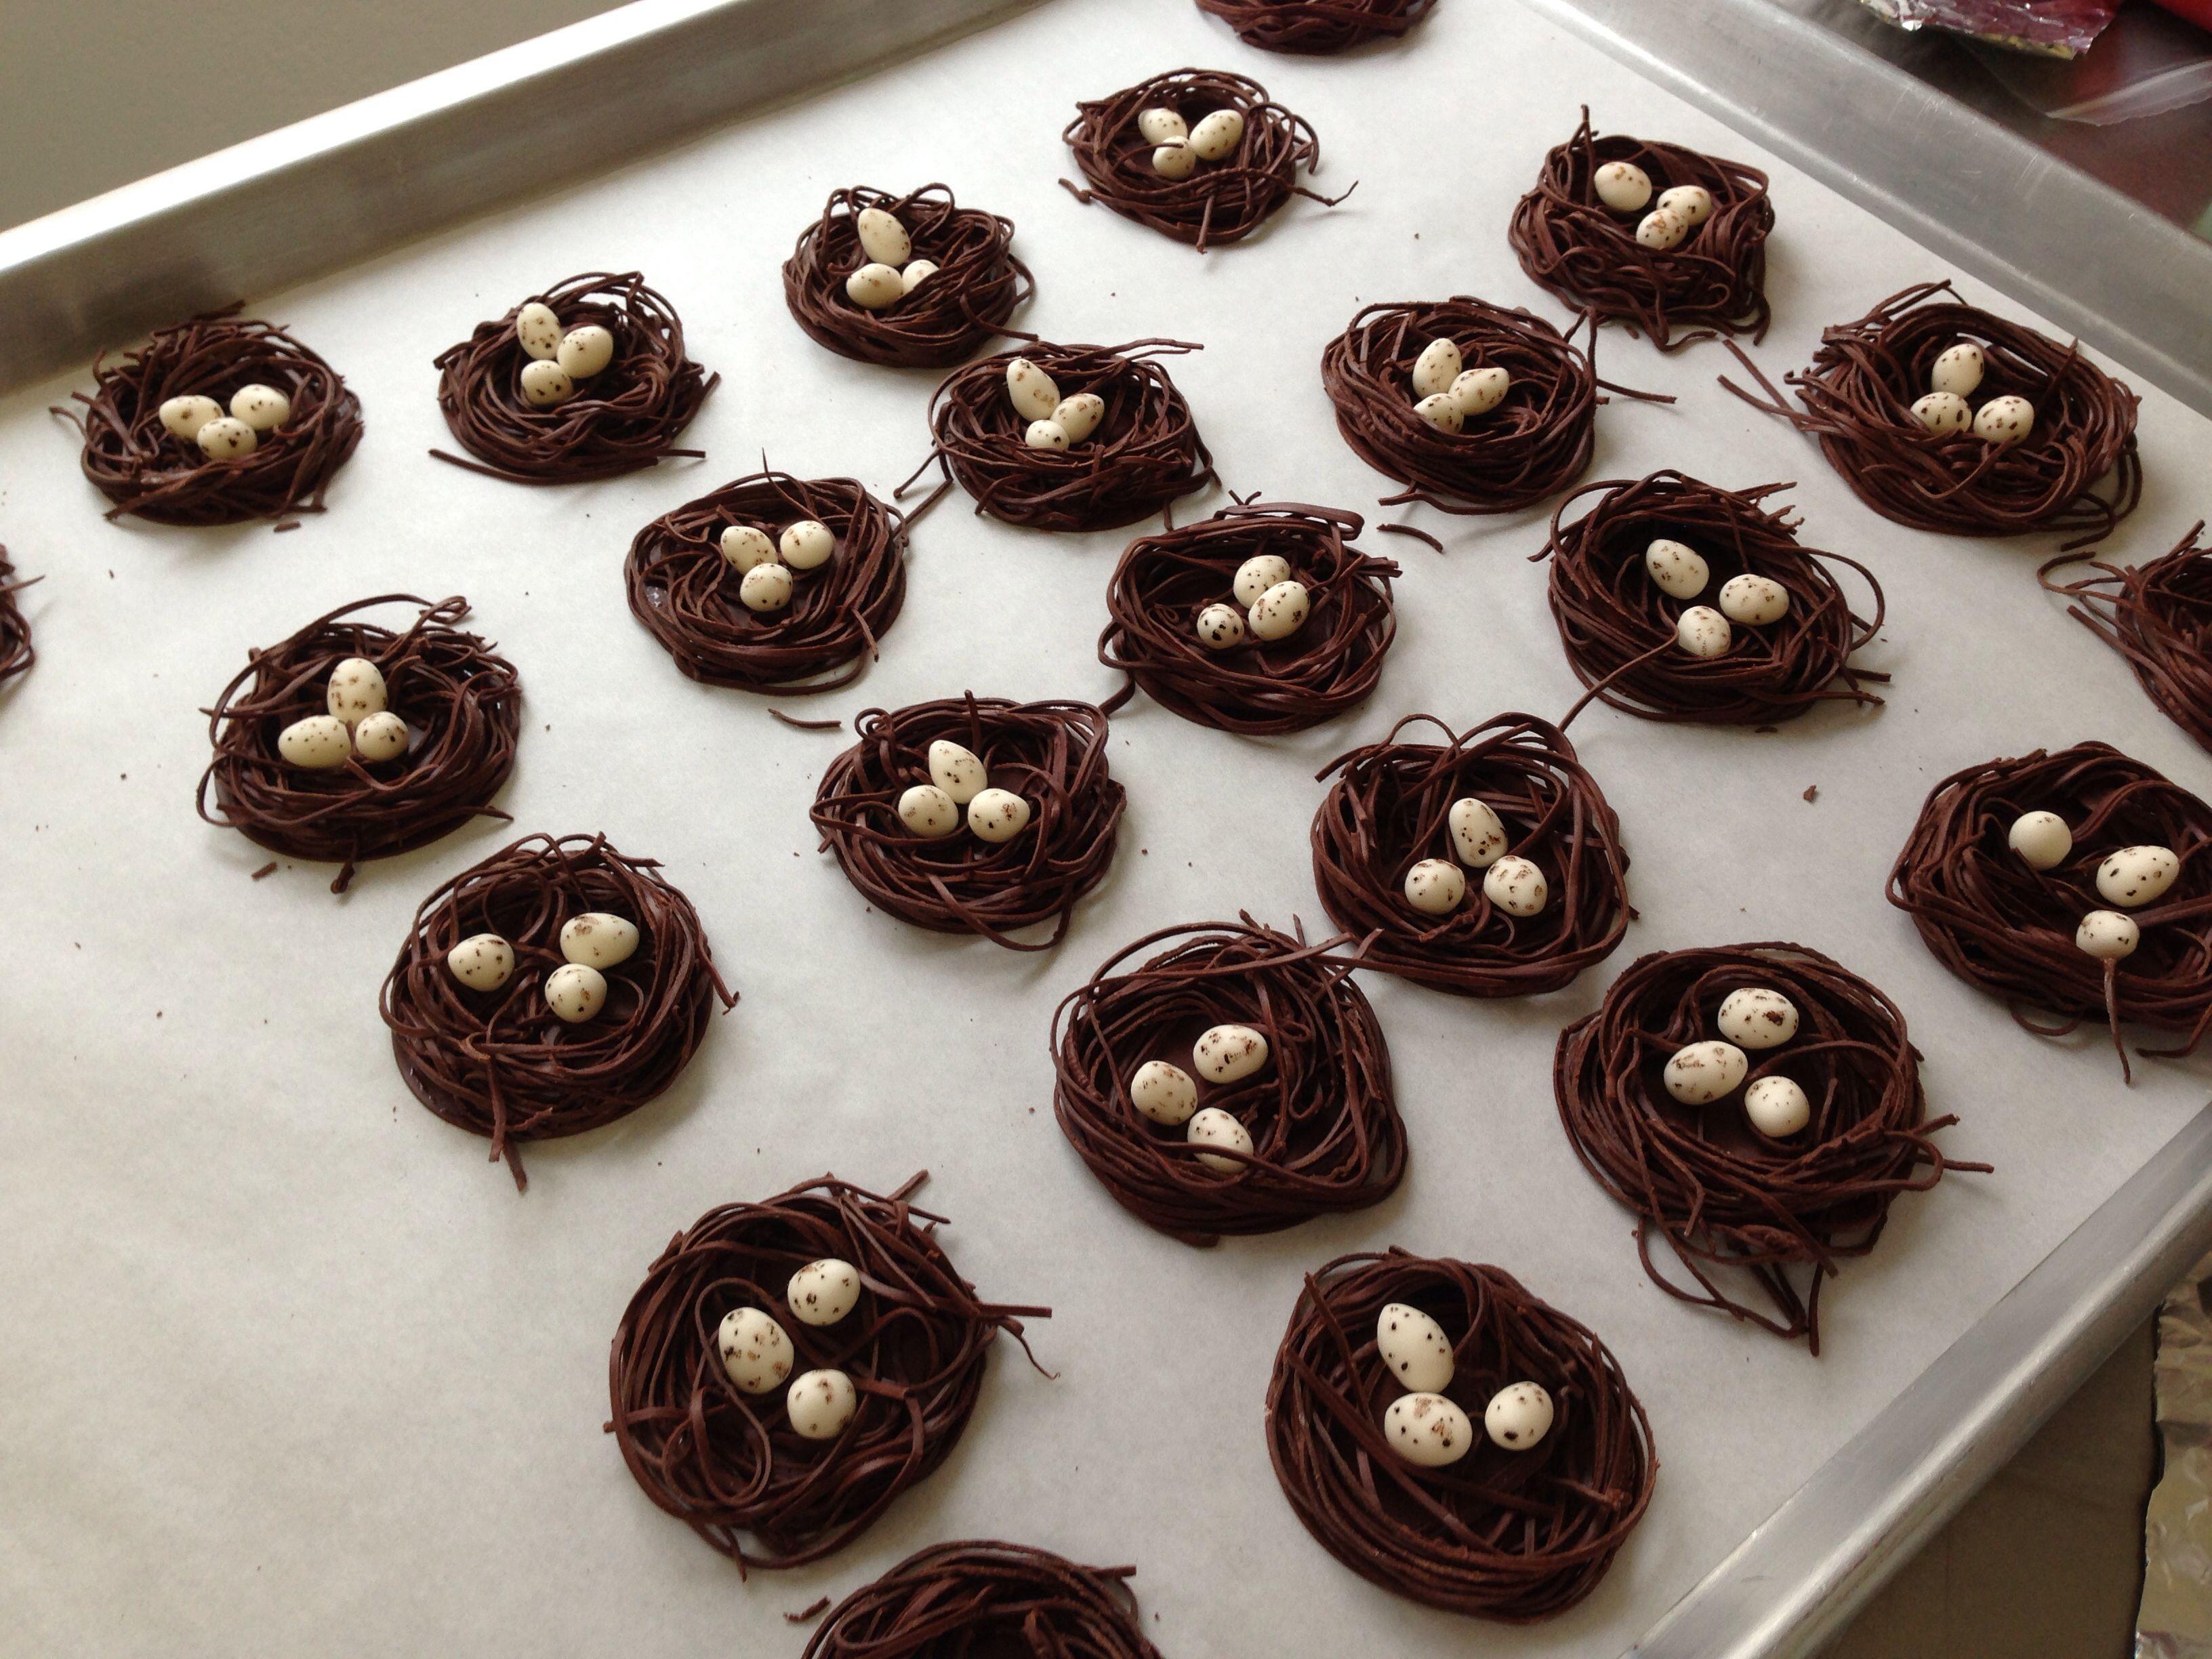 Modeling chocolate bird nests with fondant eggs | Cakes ...